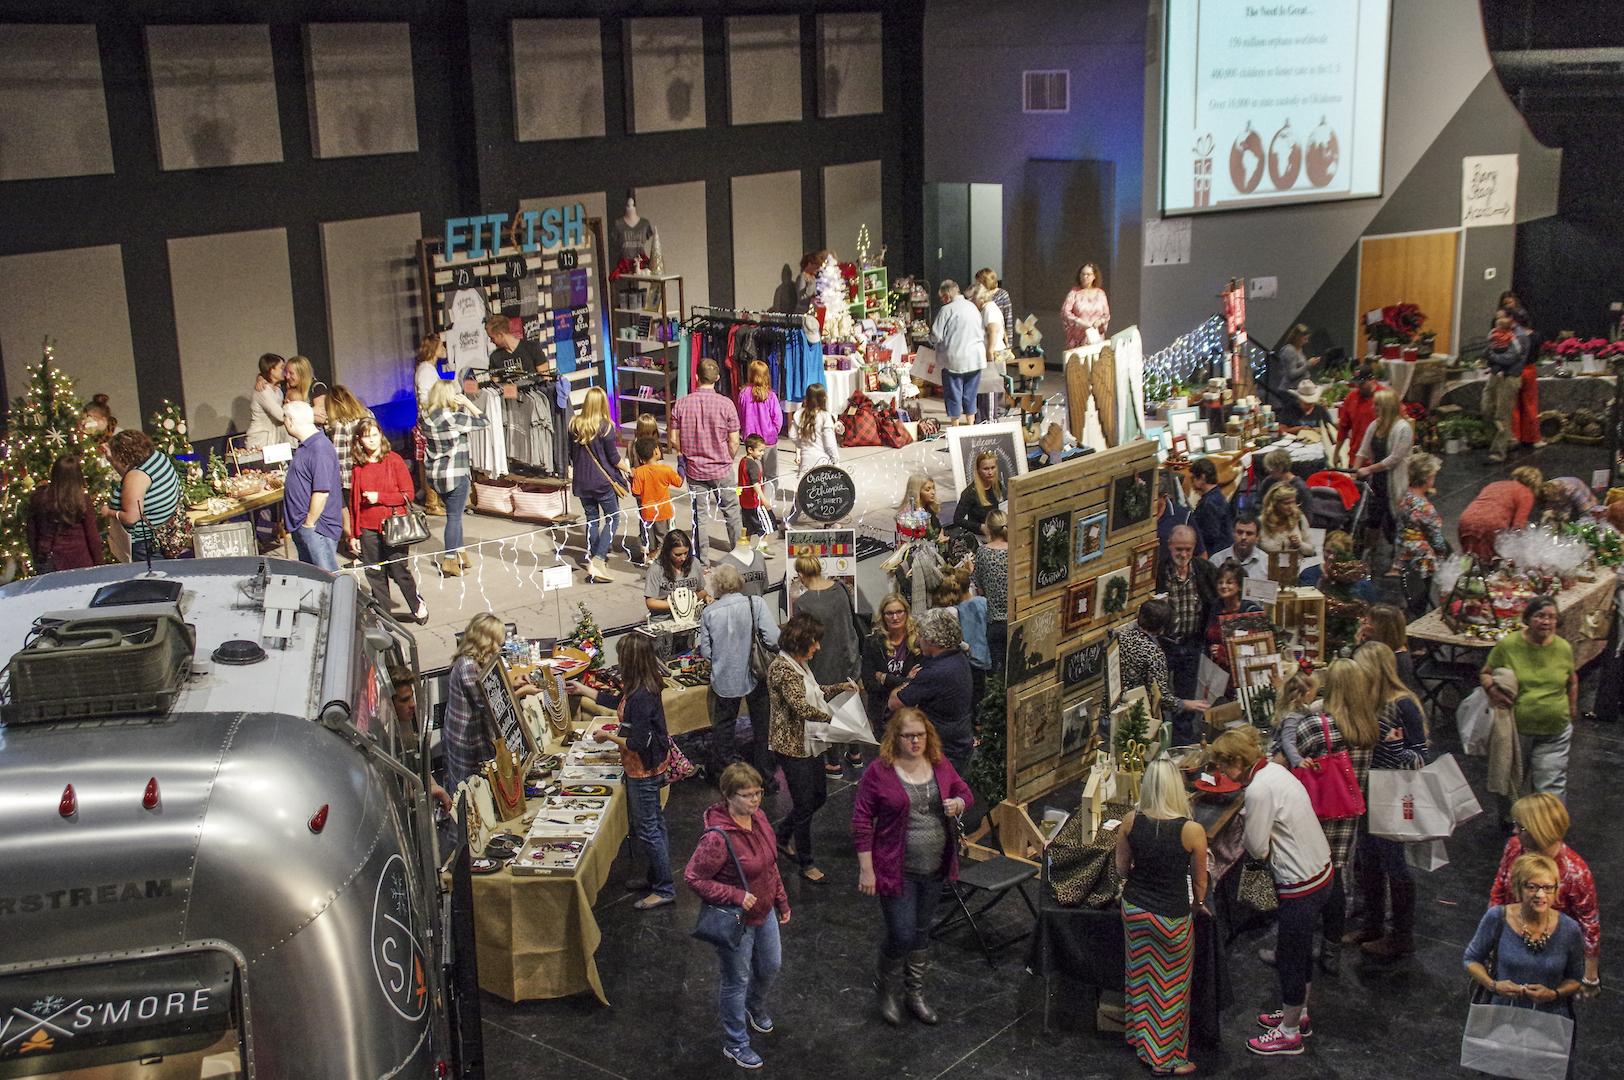 Christmas Craft Show, Dec. 8, 2020 2020 Holiday Craft Shows & Markets   MetroFamily Magazine